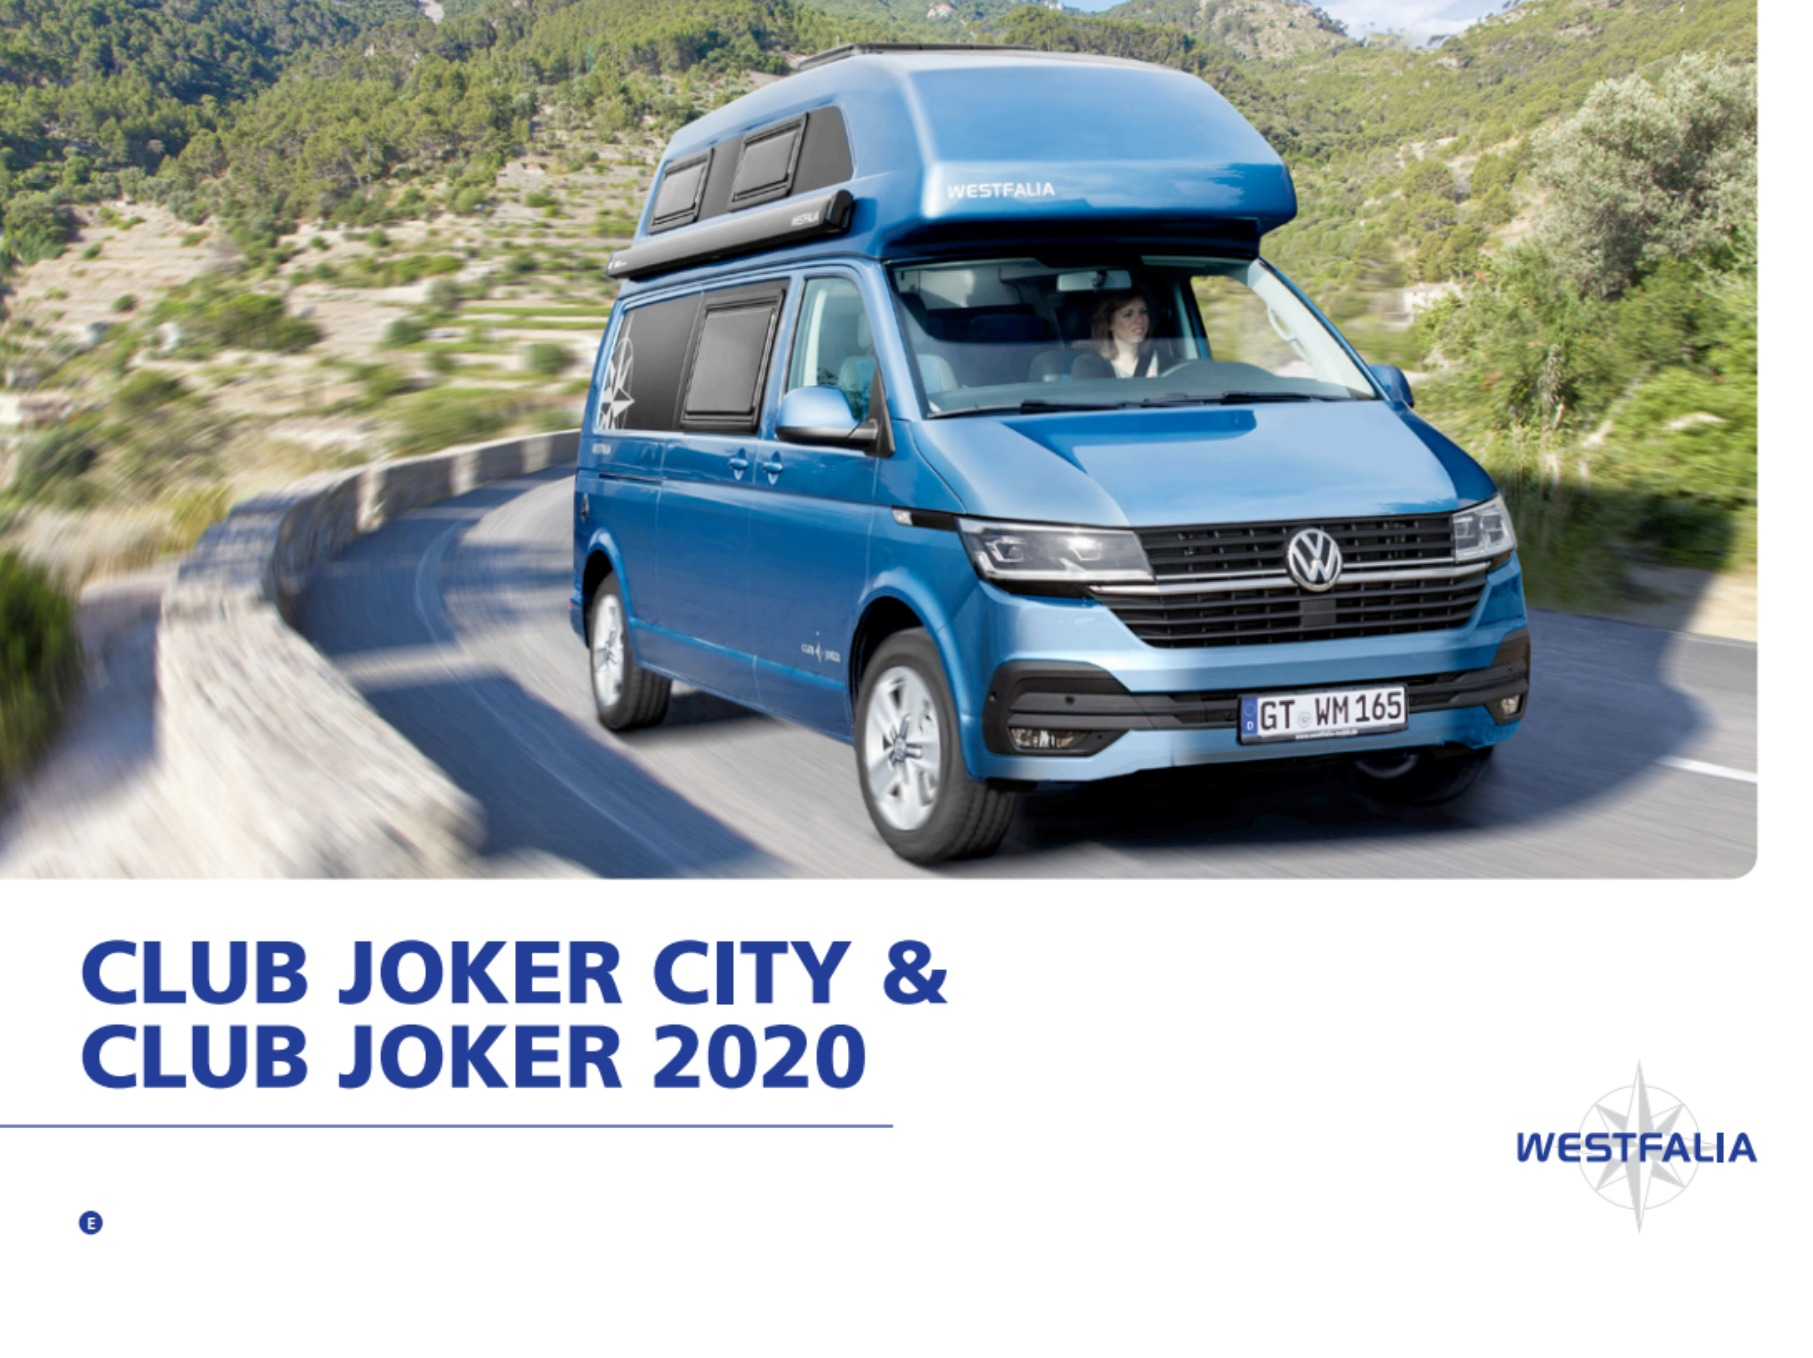 2020  Westfalia Club Joker Brochure